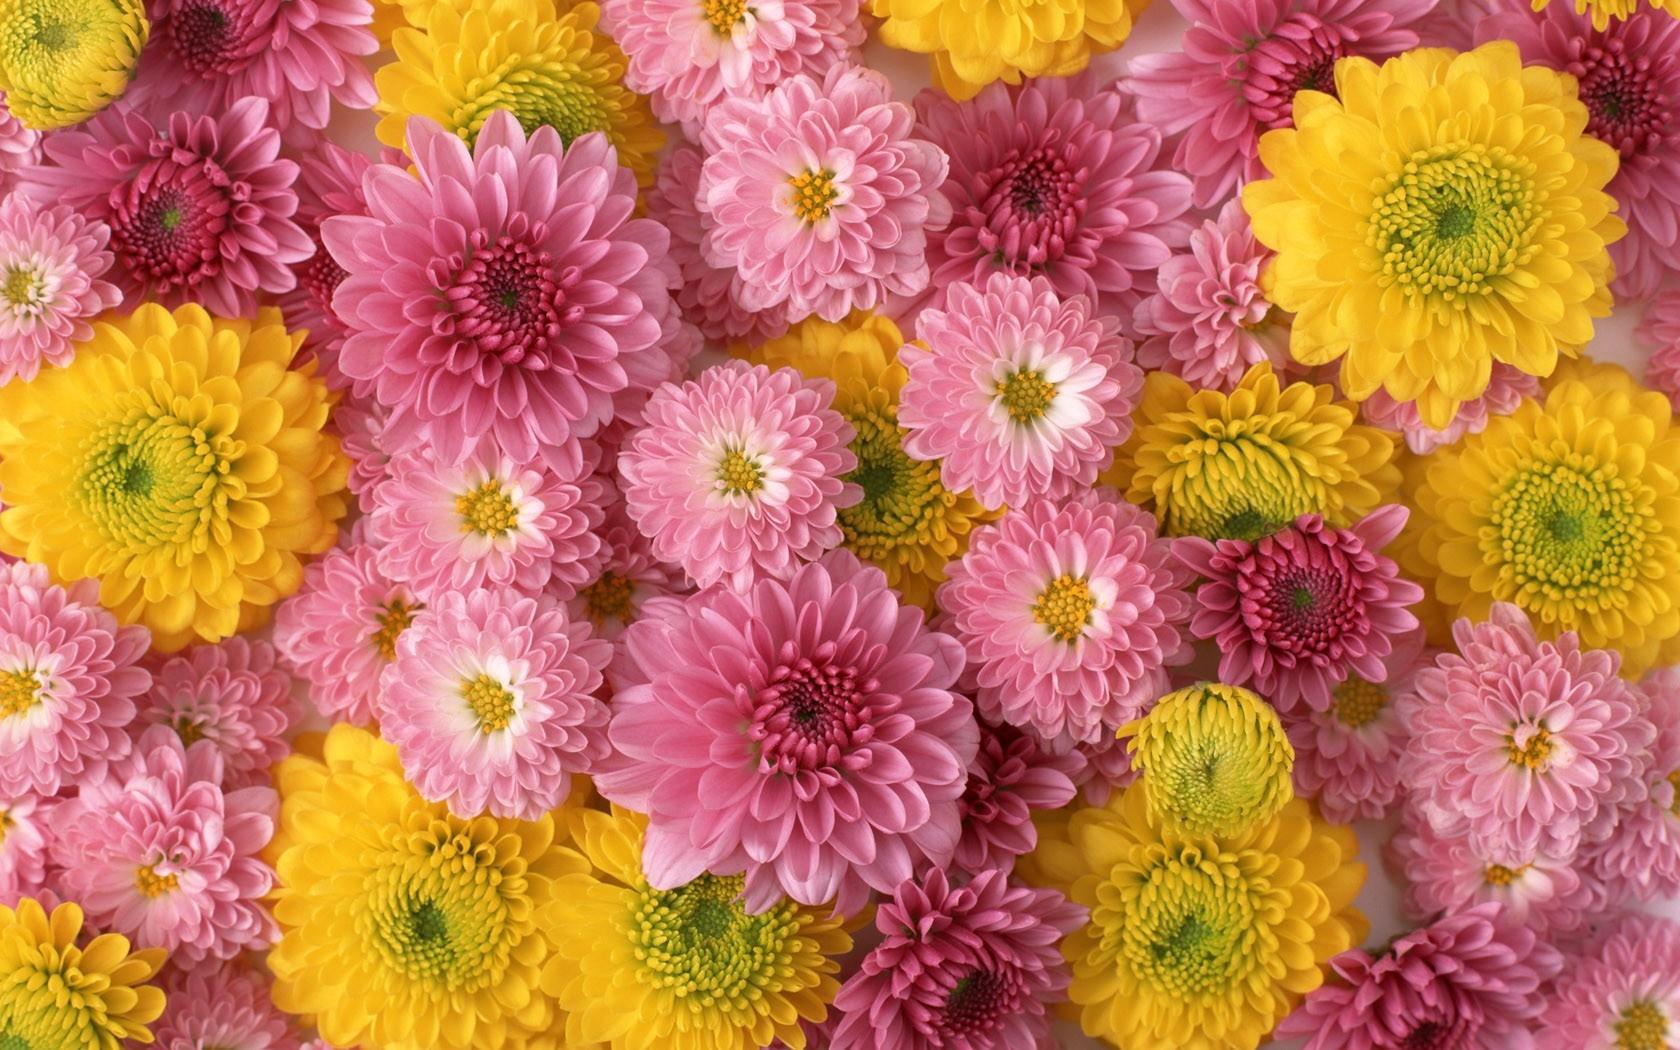 Wallpaper chrysanthemums flowers buds yellow pink composition chrysanthemums flowers buds yellow pink composition mightylinksfo Gallery